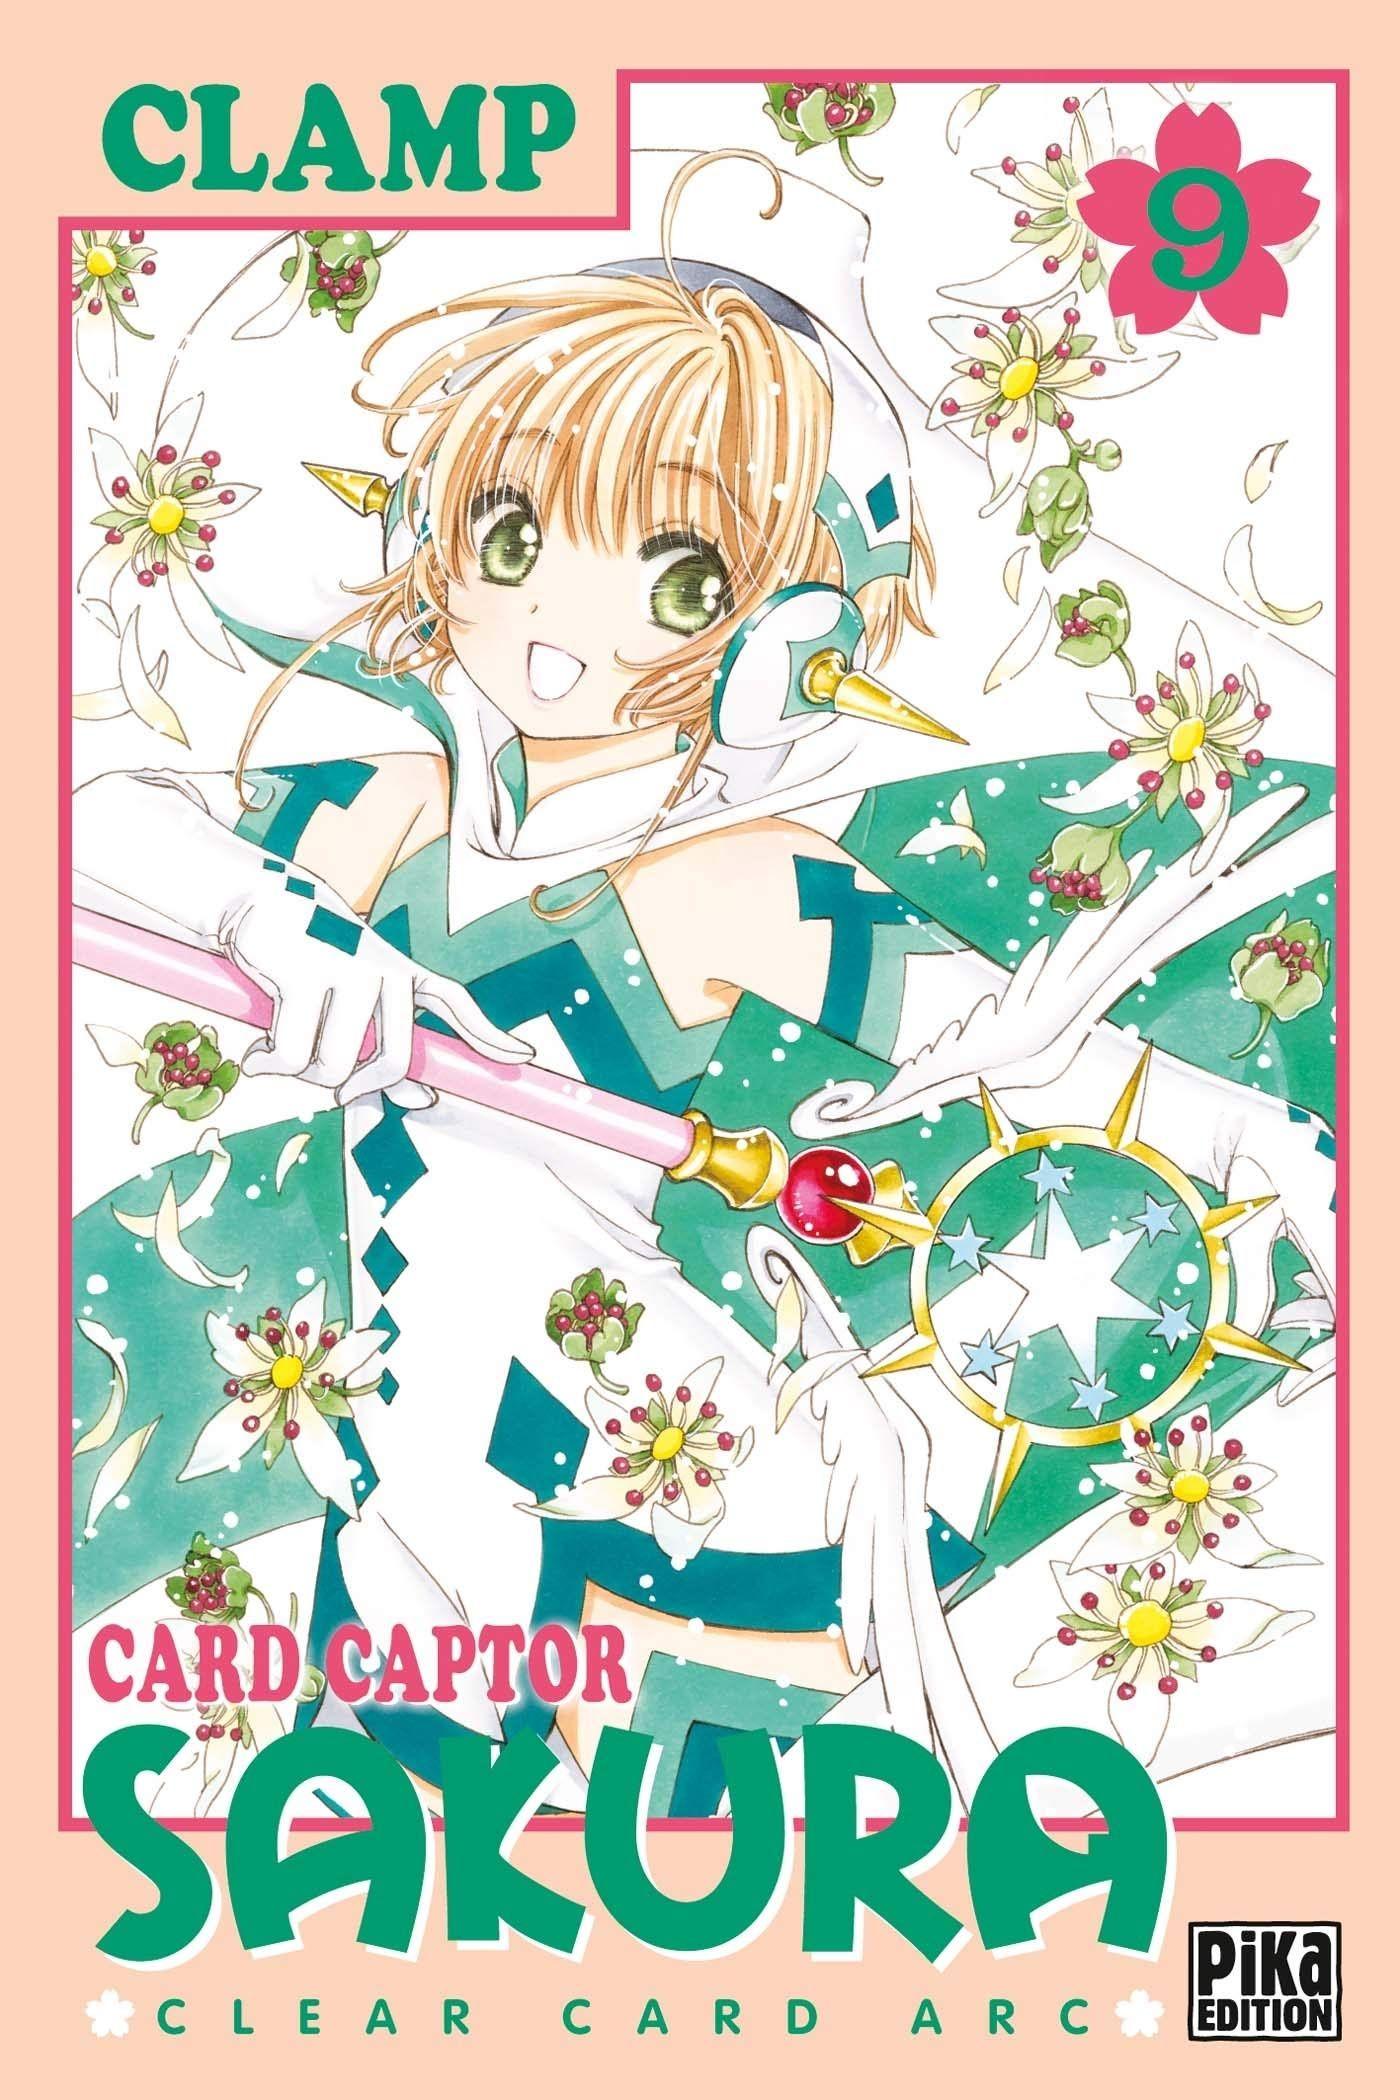 Sortie Manga au Québec JUIN 2021 Cc-sakura-clear-card-9-pika